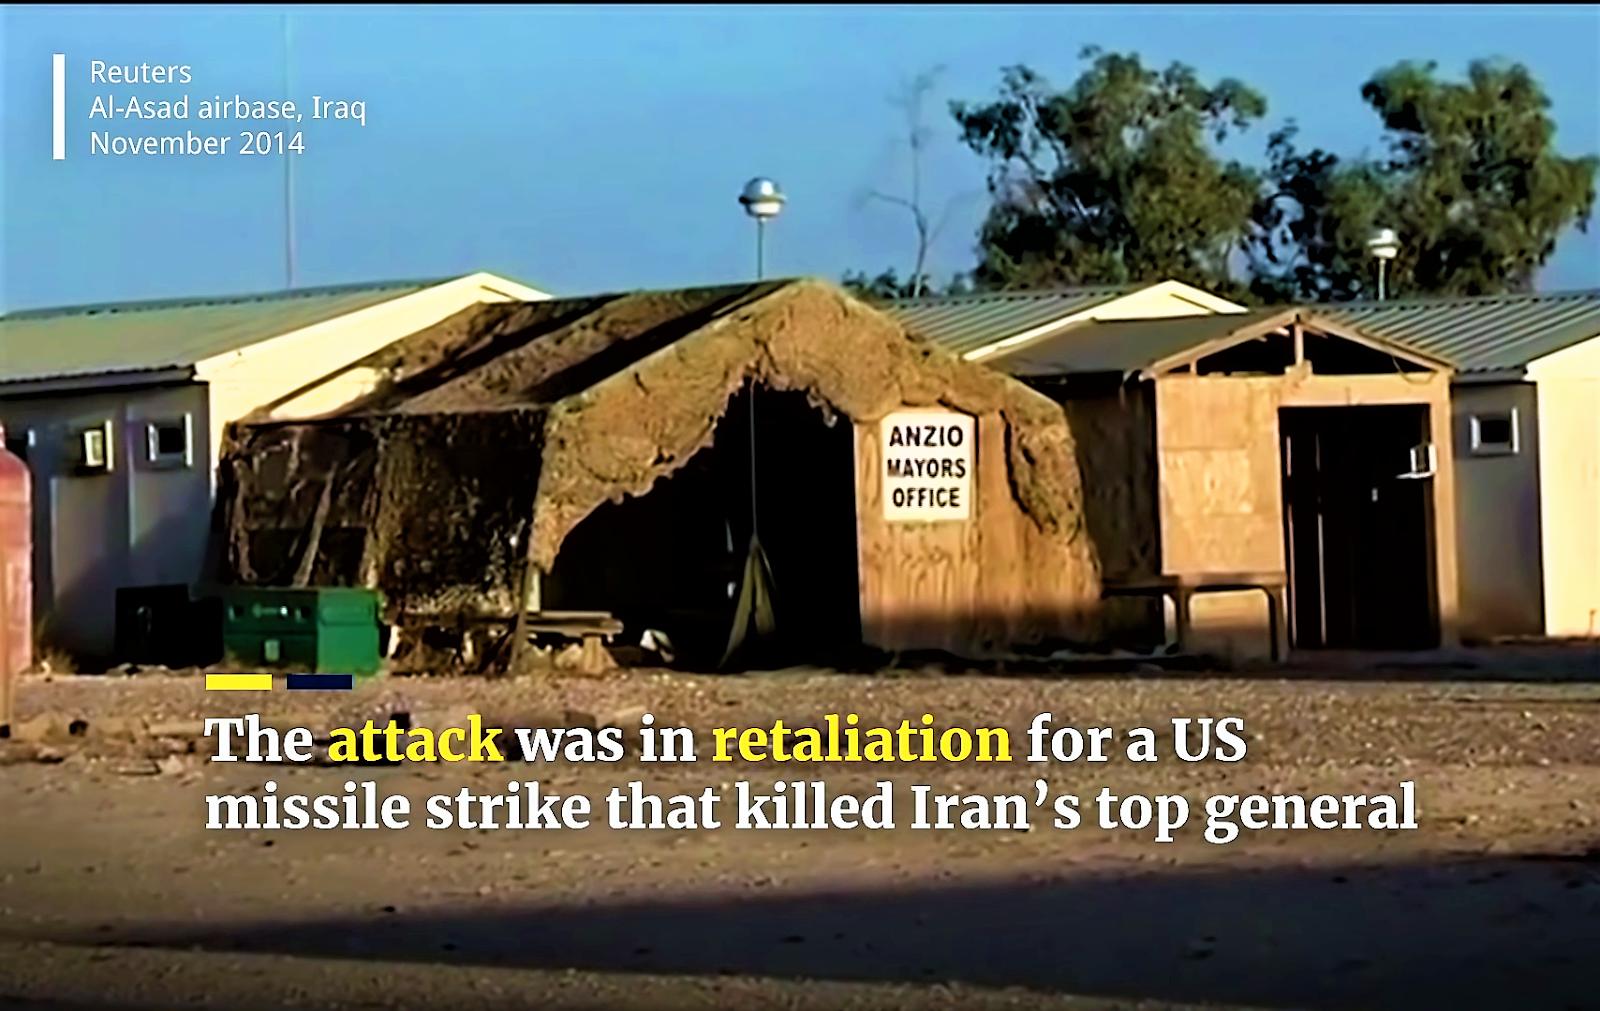 Al asad air base, Iran targeting US forces in Iraq.